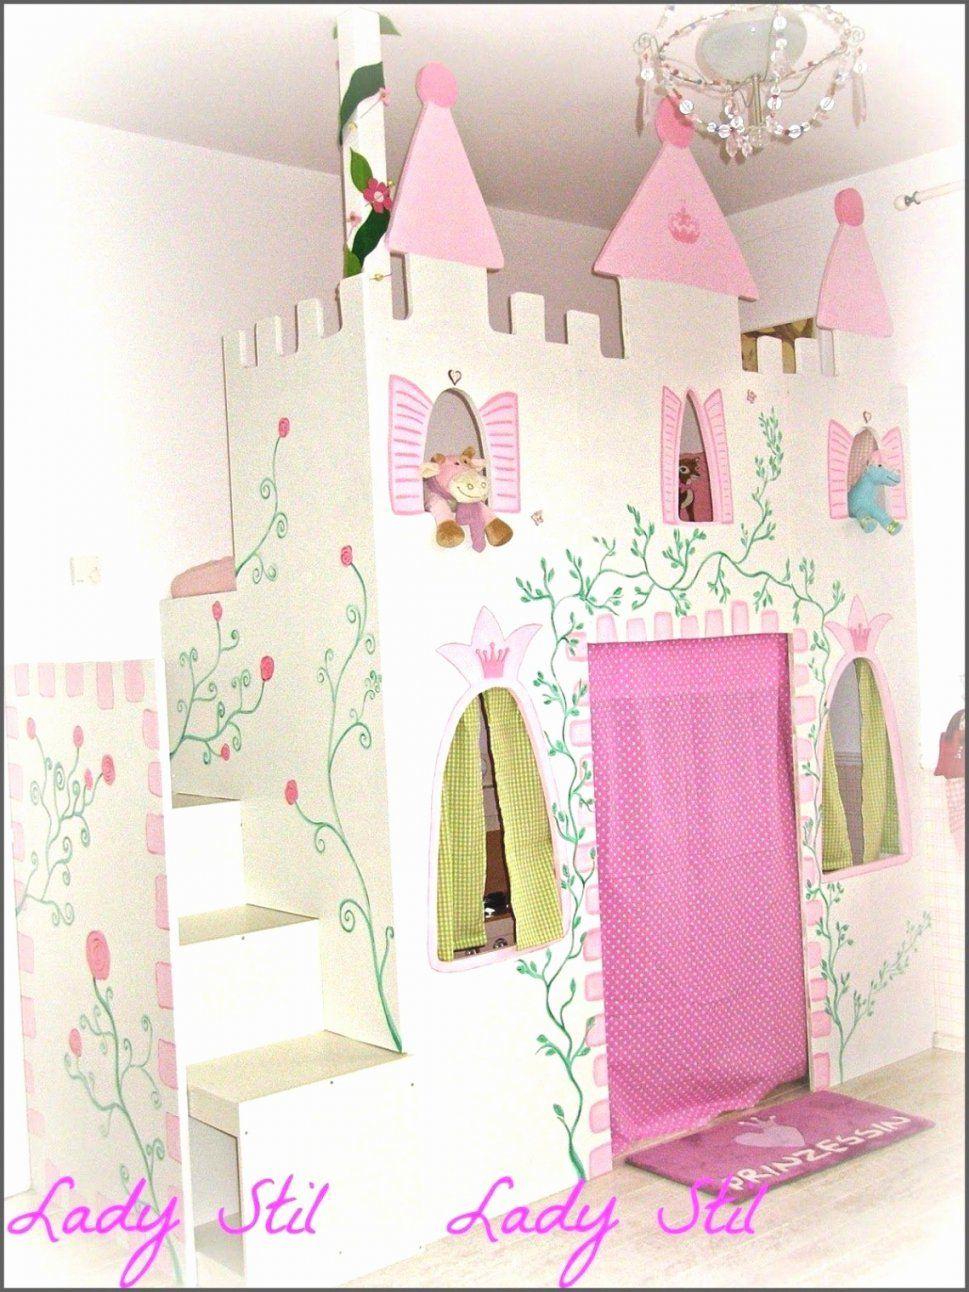 Kinderbett Selber Bauen Prinzessin Inspirierend Schön Erstaunlich von Prinzessin Bett Selber Bauen Photo